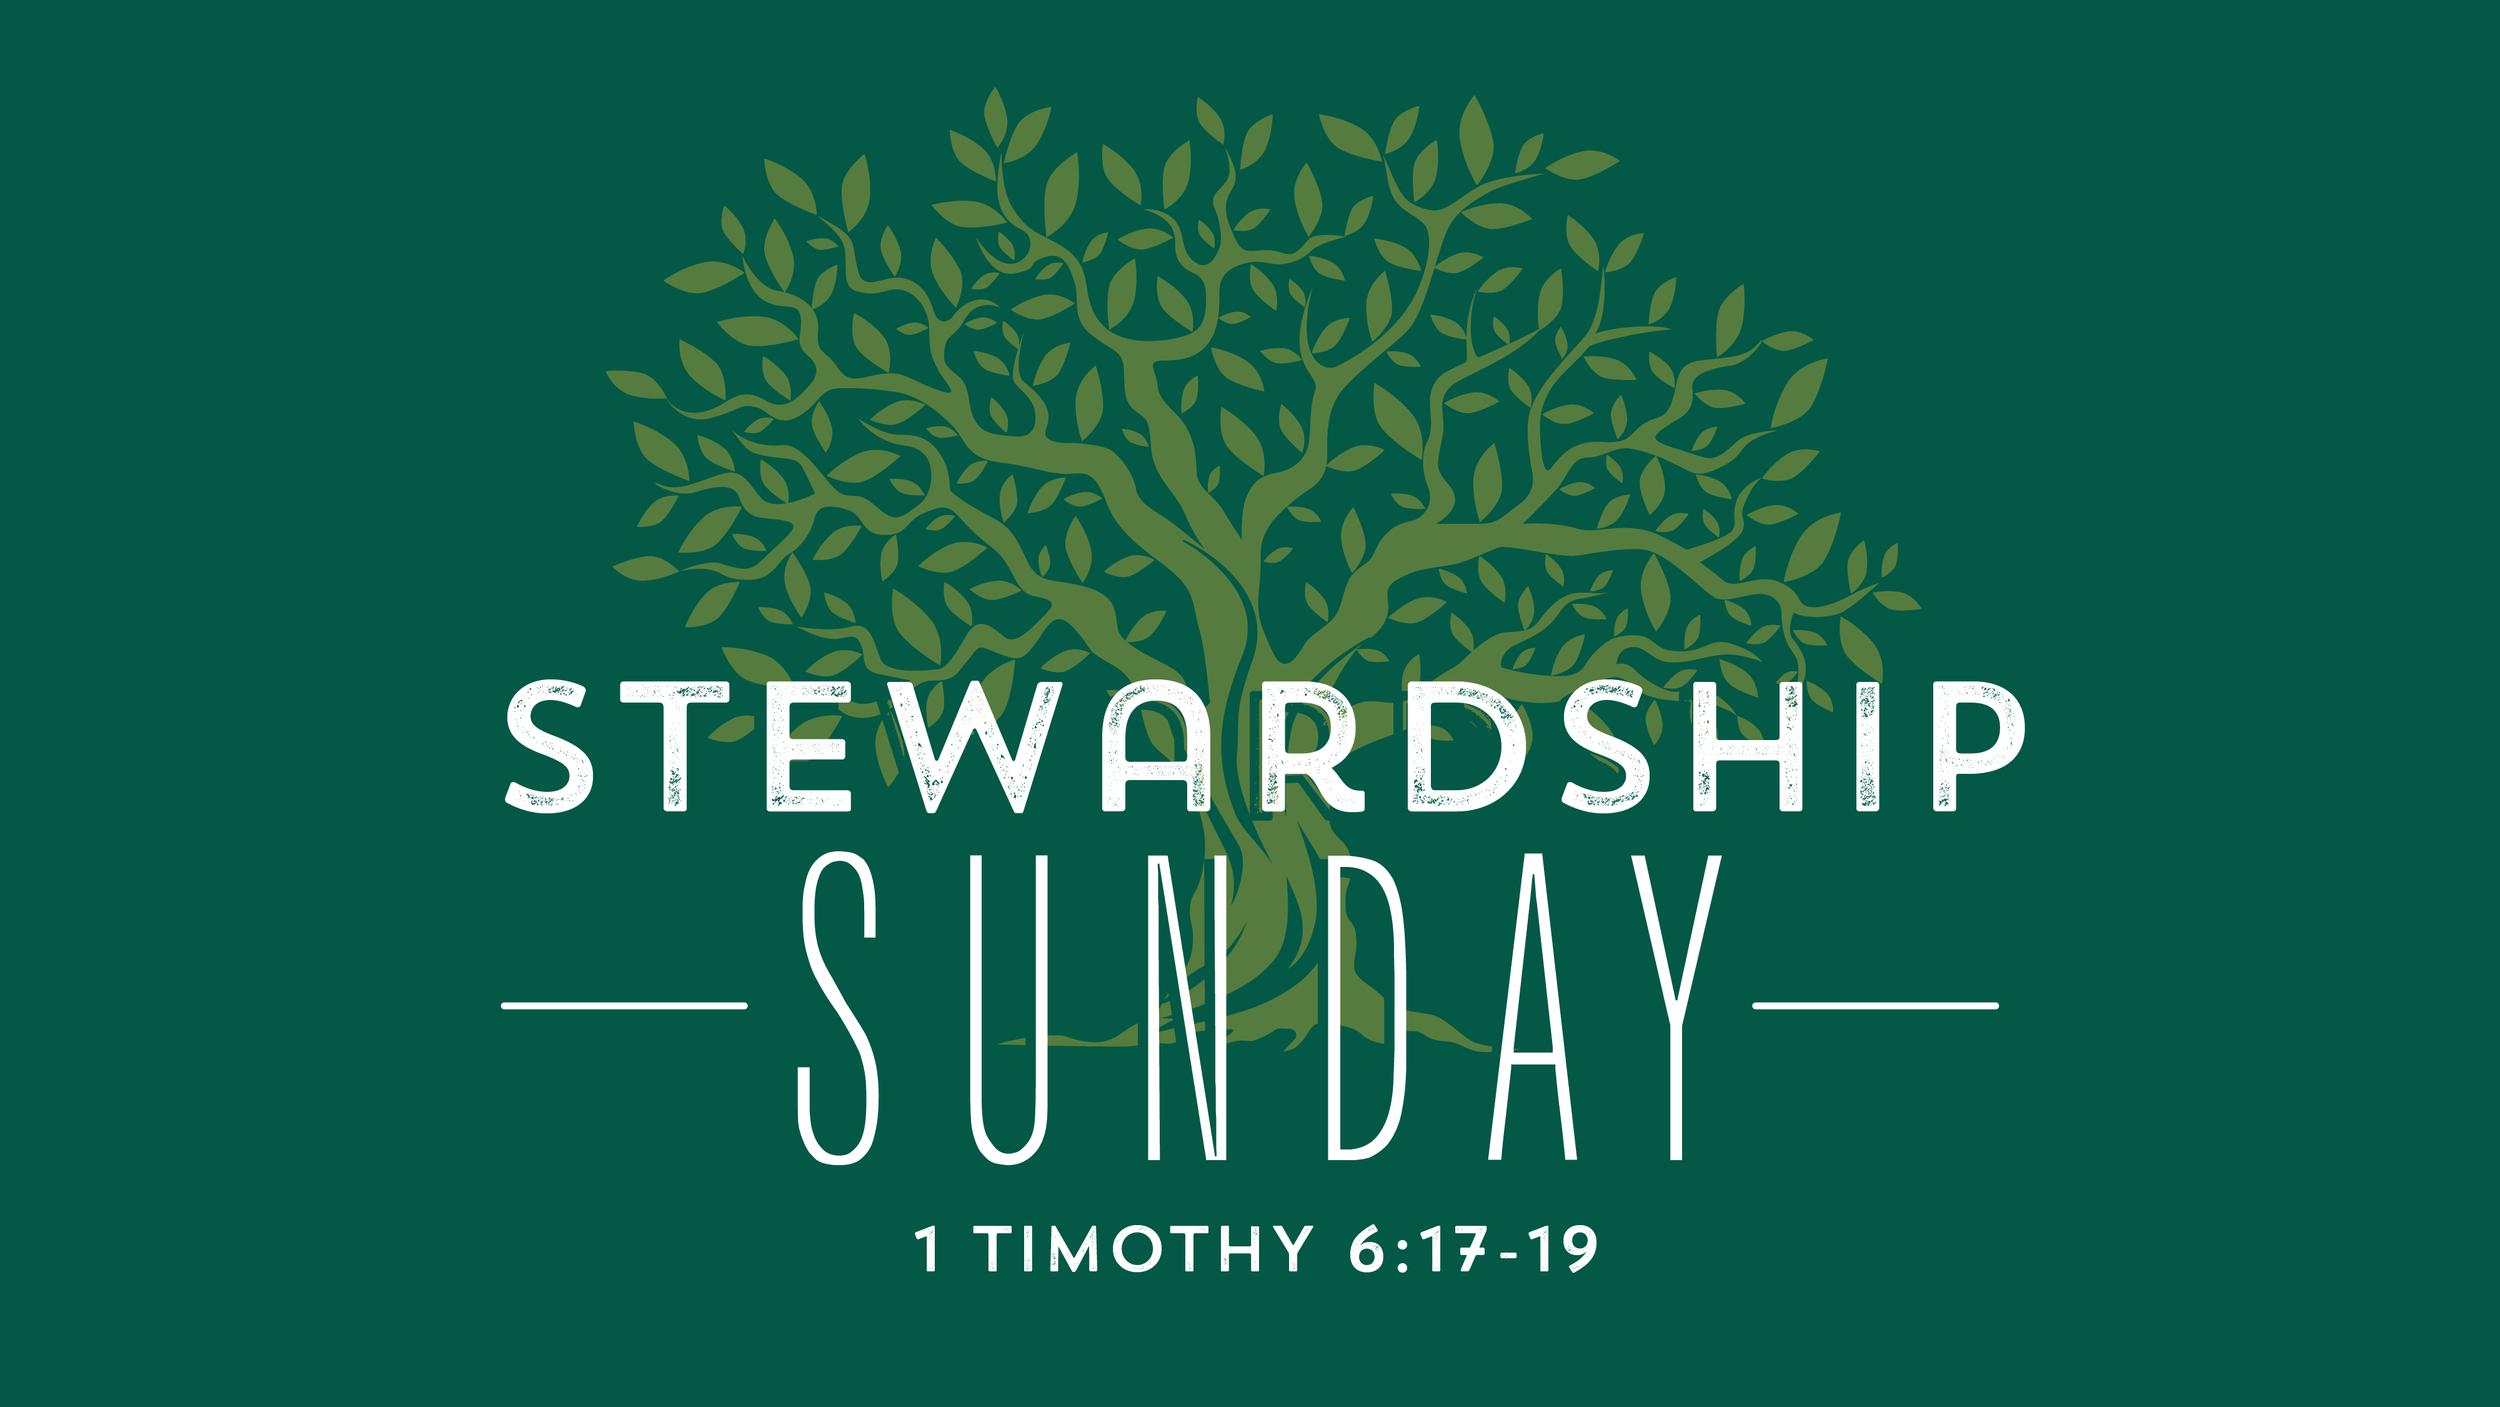 StewardshipSunday2018.png